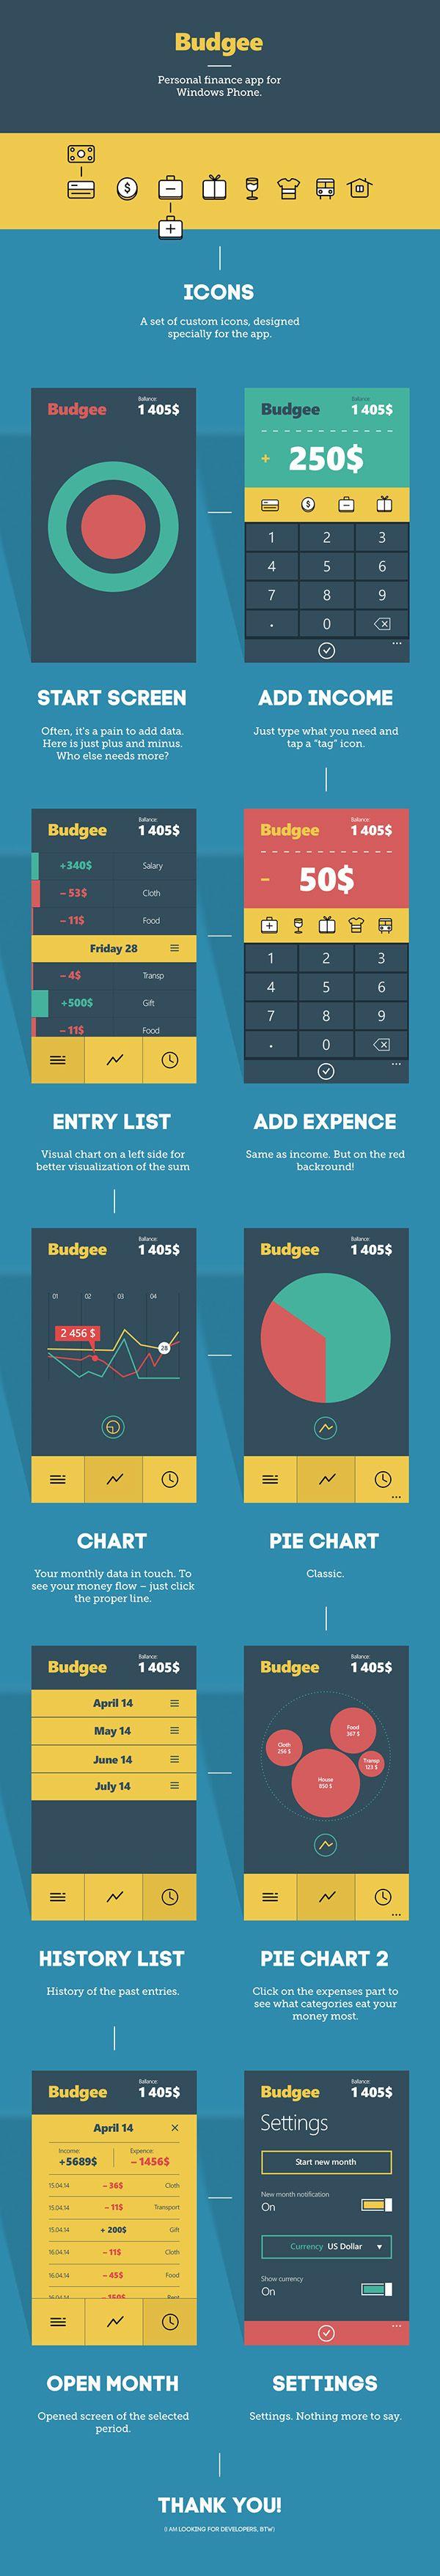 Budgee app by Egor Tatarenko, via Behance